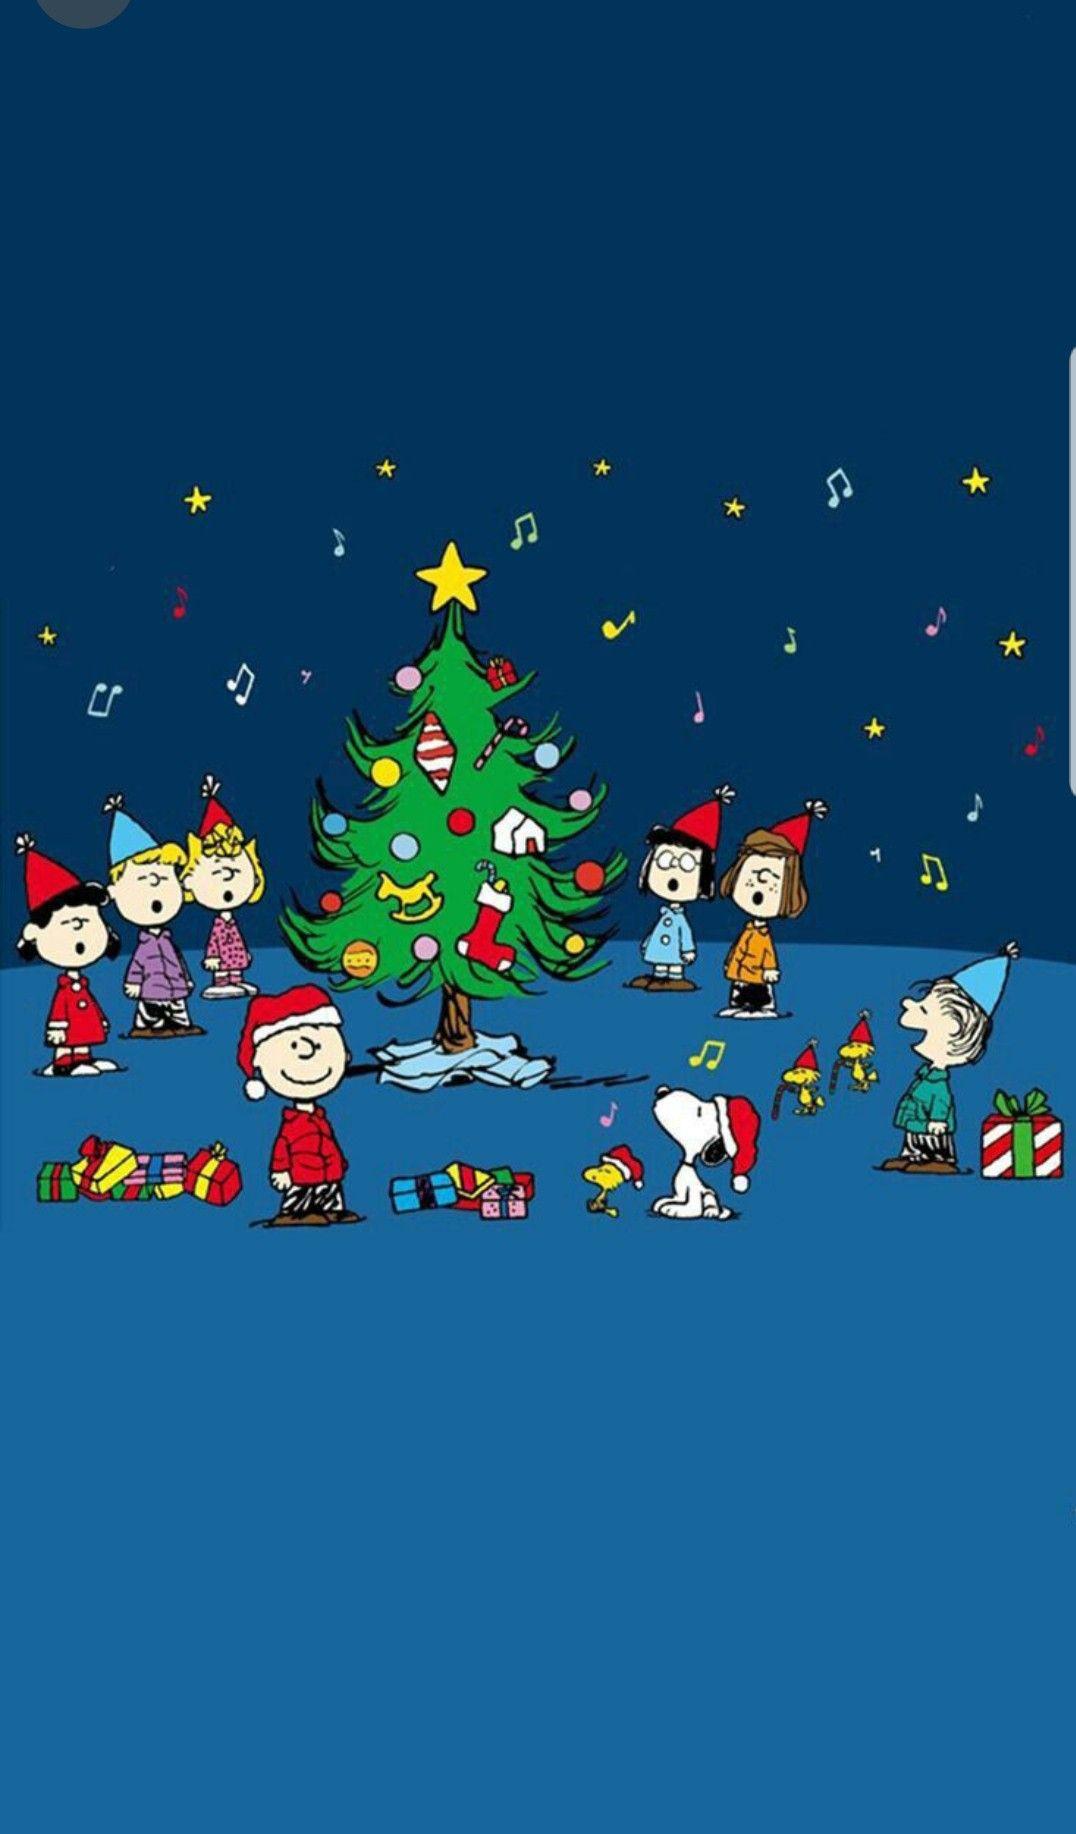 christmas phone backgrounds snoopy wallpaper peanuts gang peanuts cartoon merry christmas